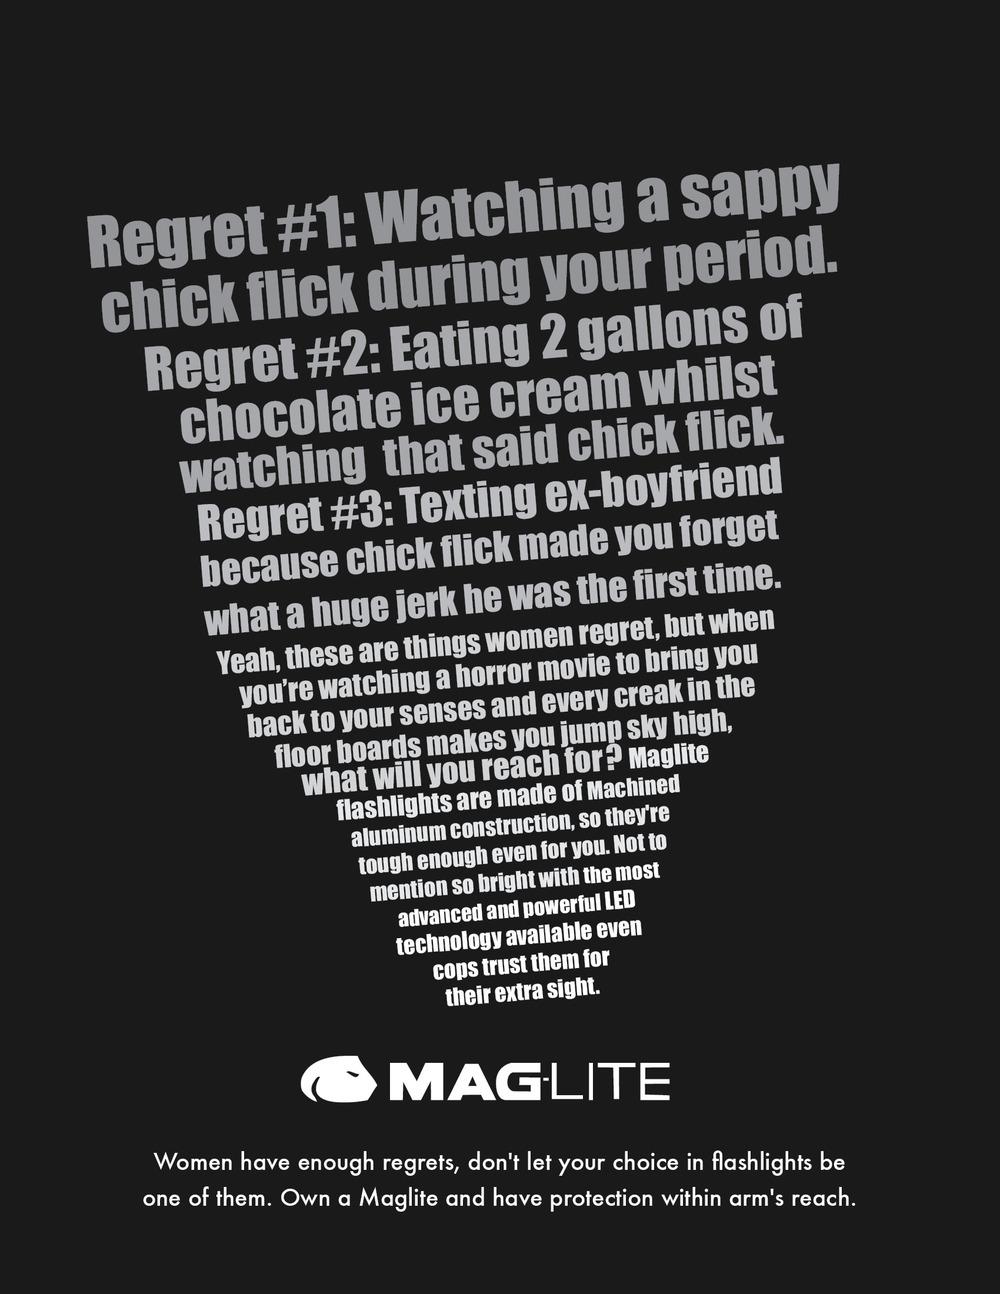 Maglite_Ad2_v3.jpg